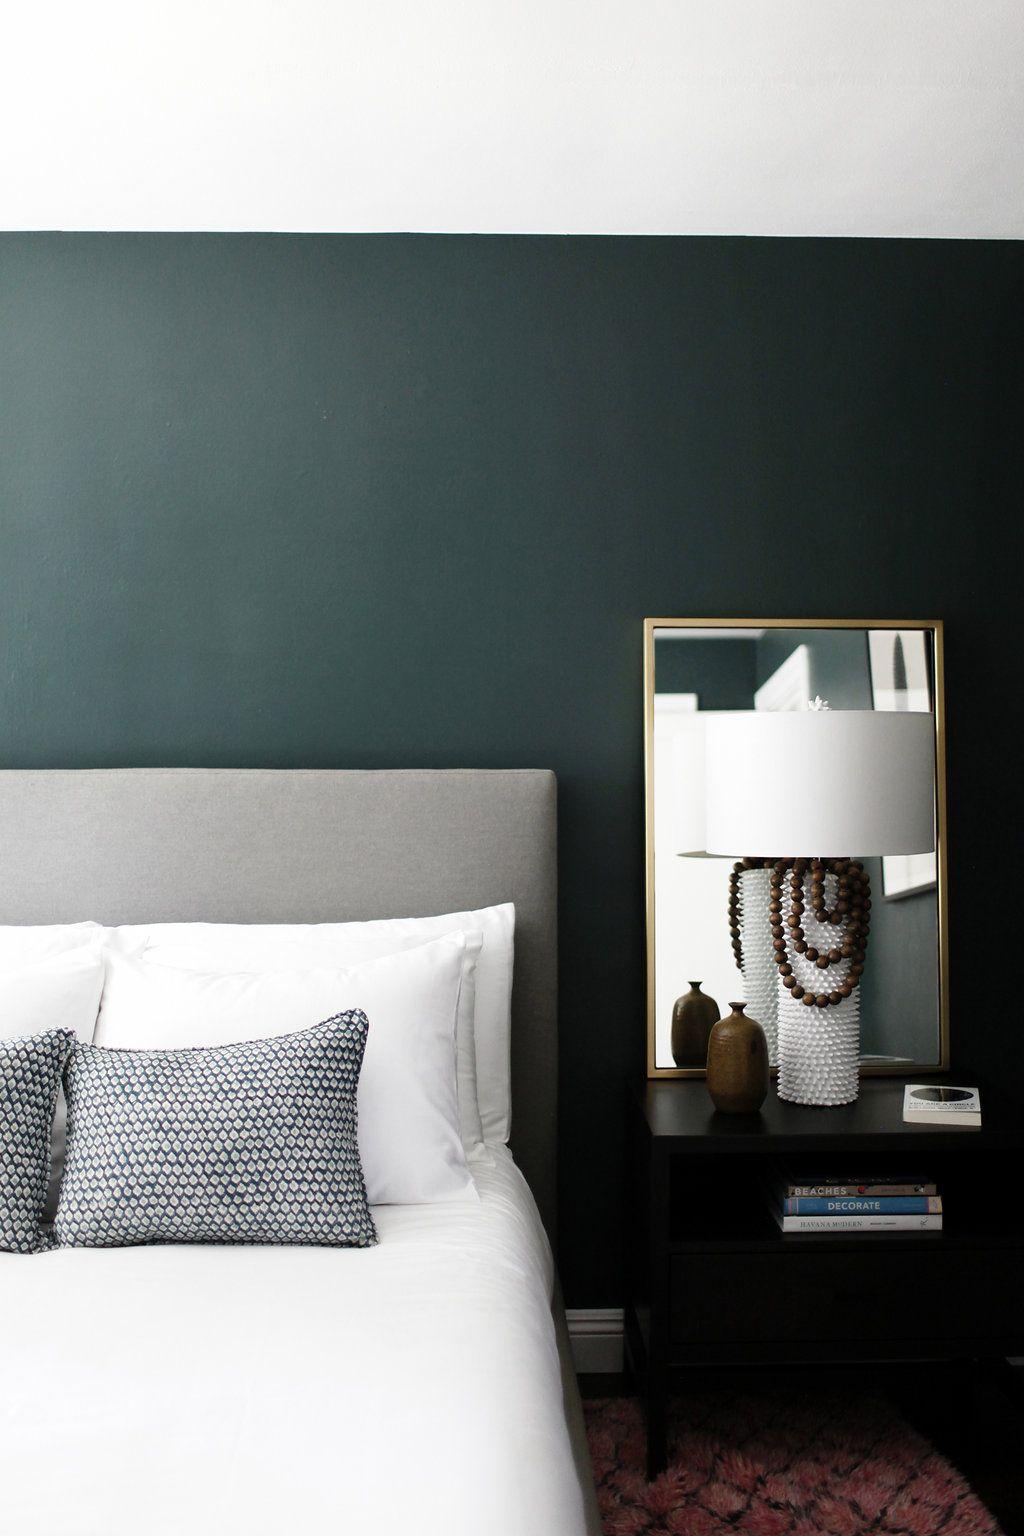 Minimalist Bedroom With Dark Green Walls